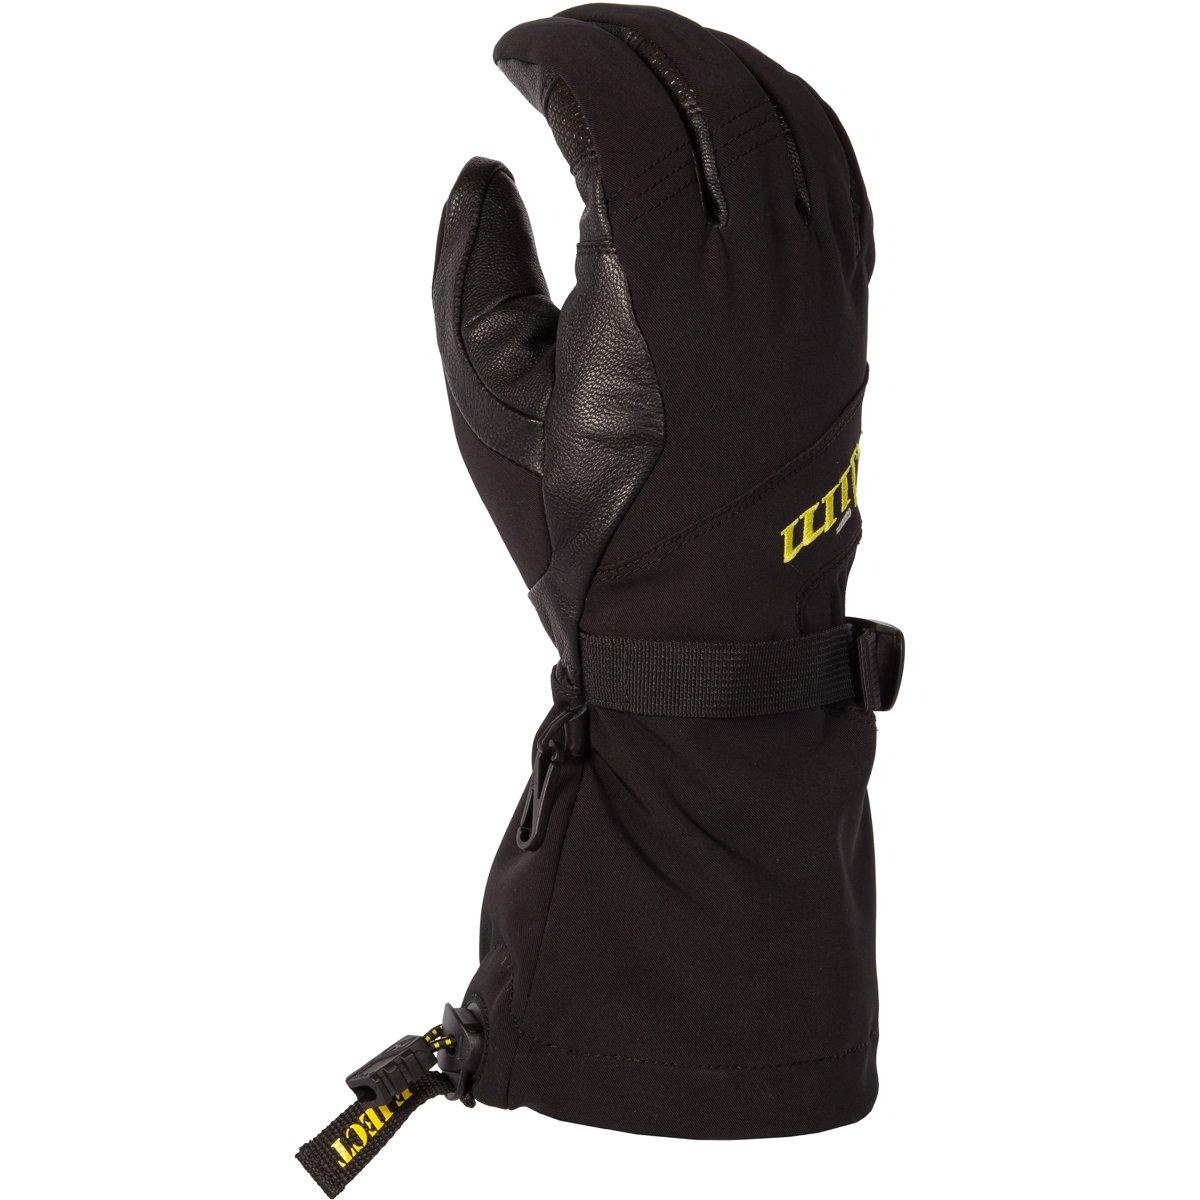 Klim Sawtelle Men's Ski Snowmobile Gloves - Black / 3X-Large